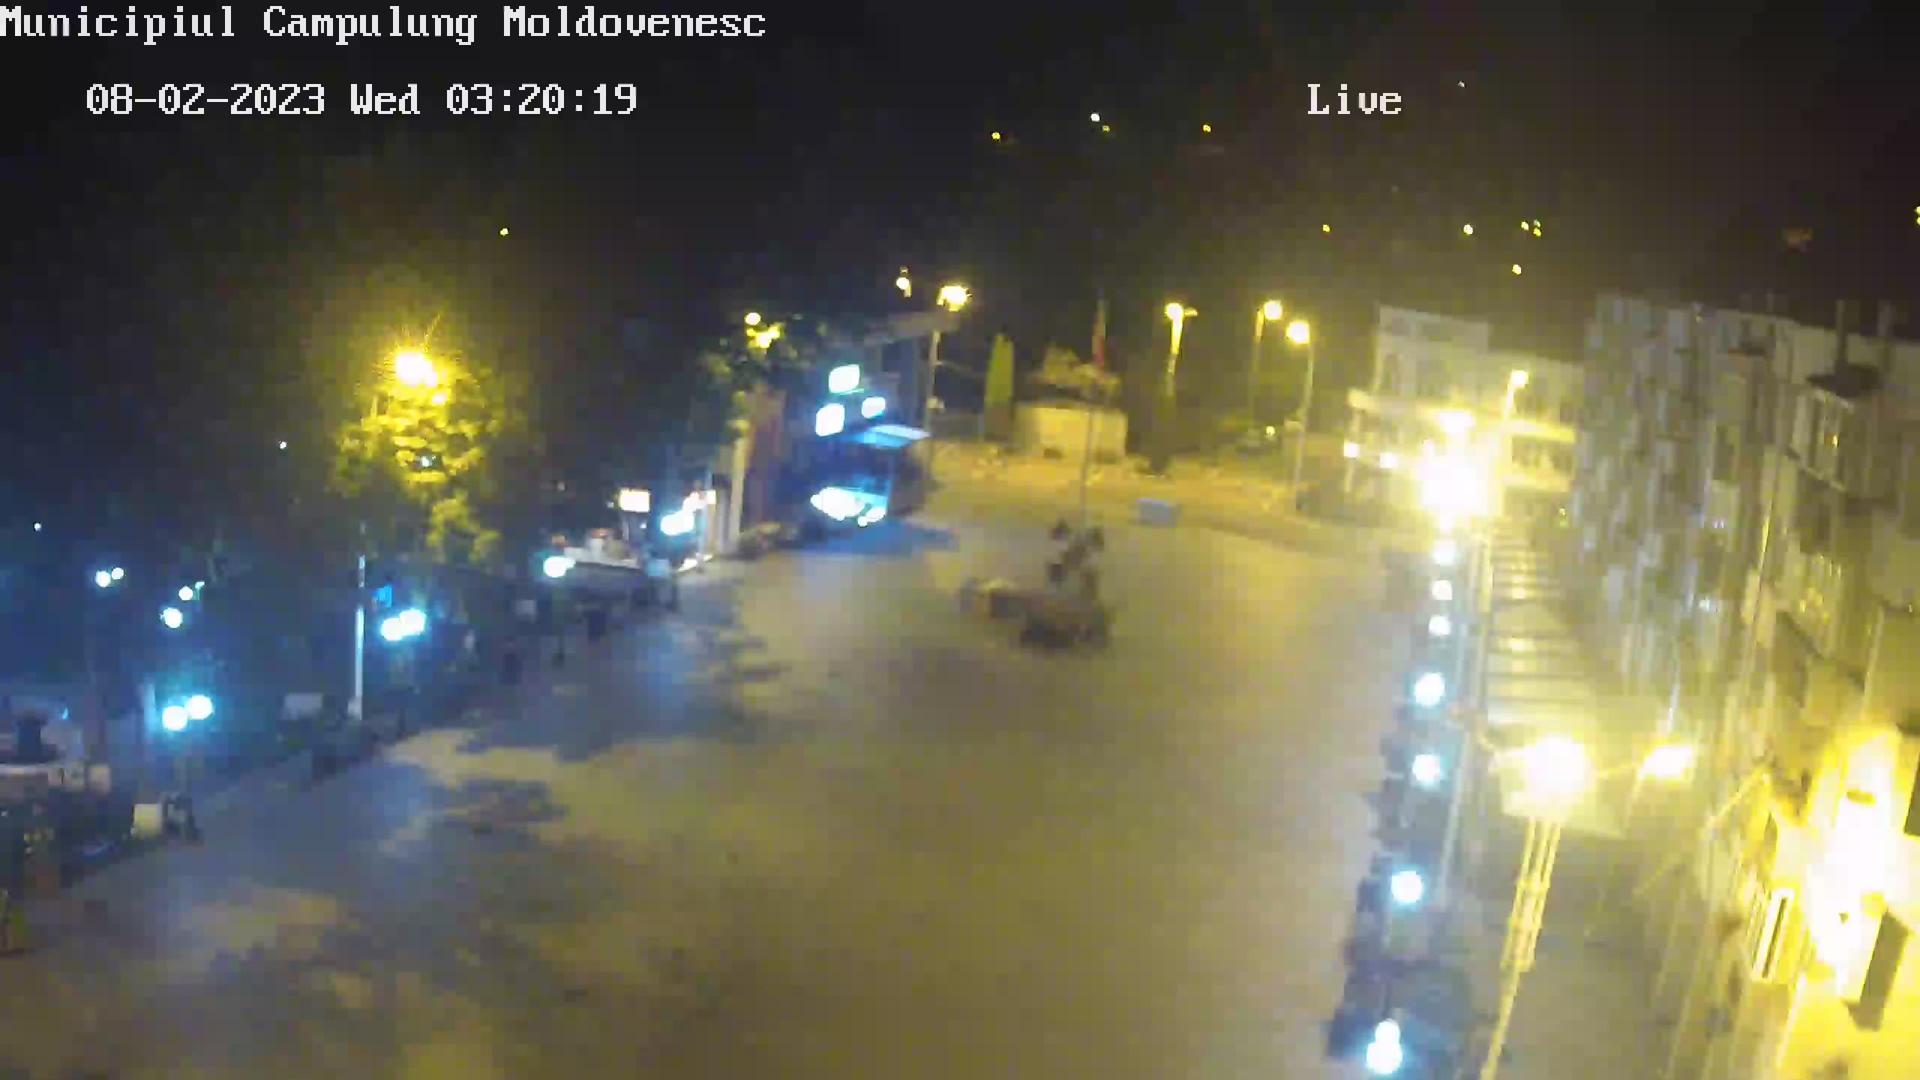 Webcam Campulung Moldovenesc